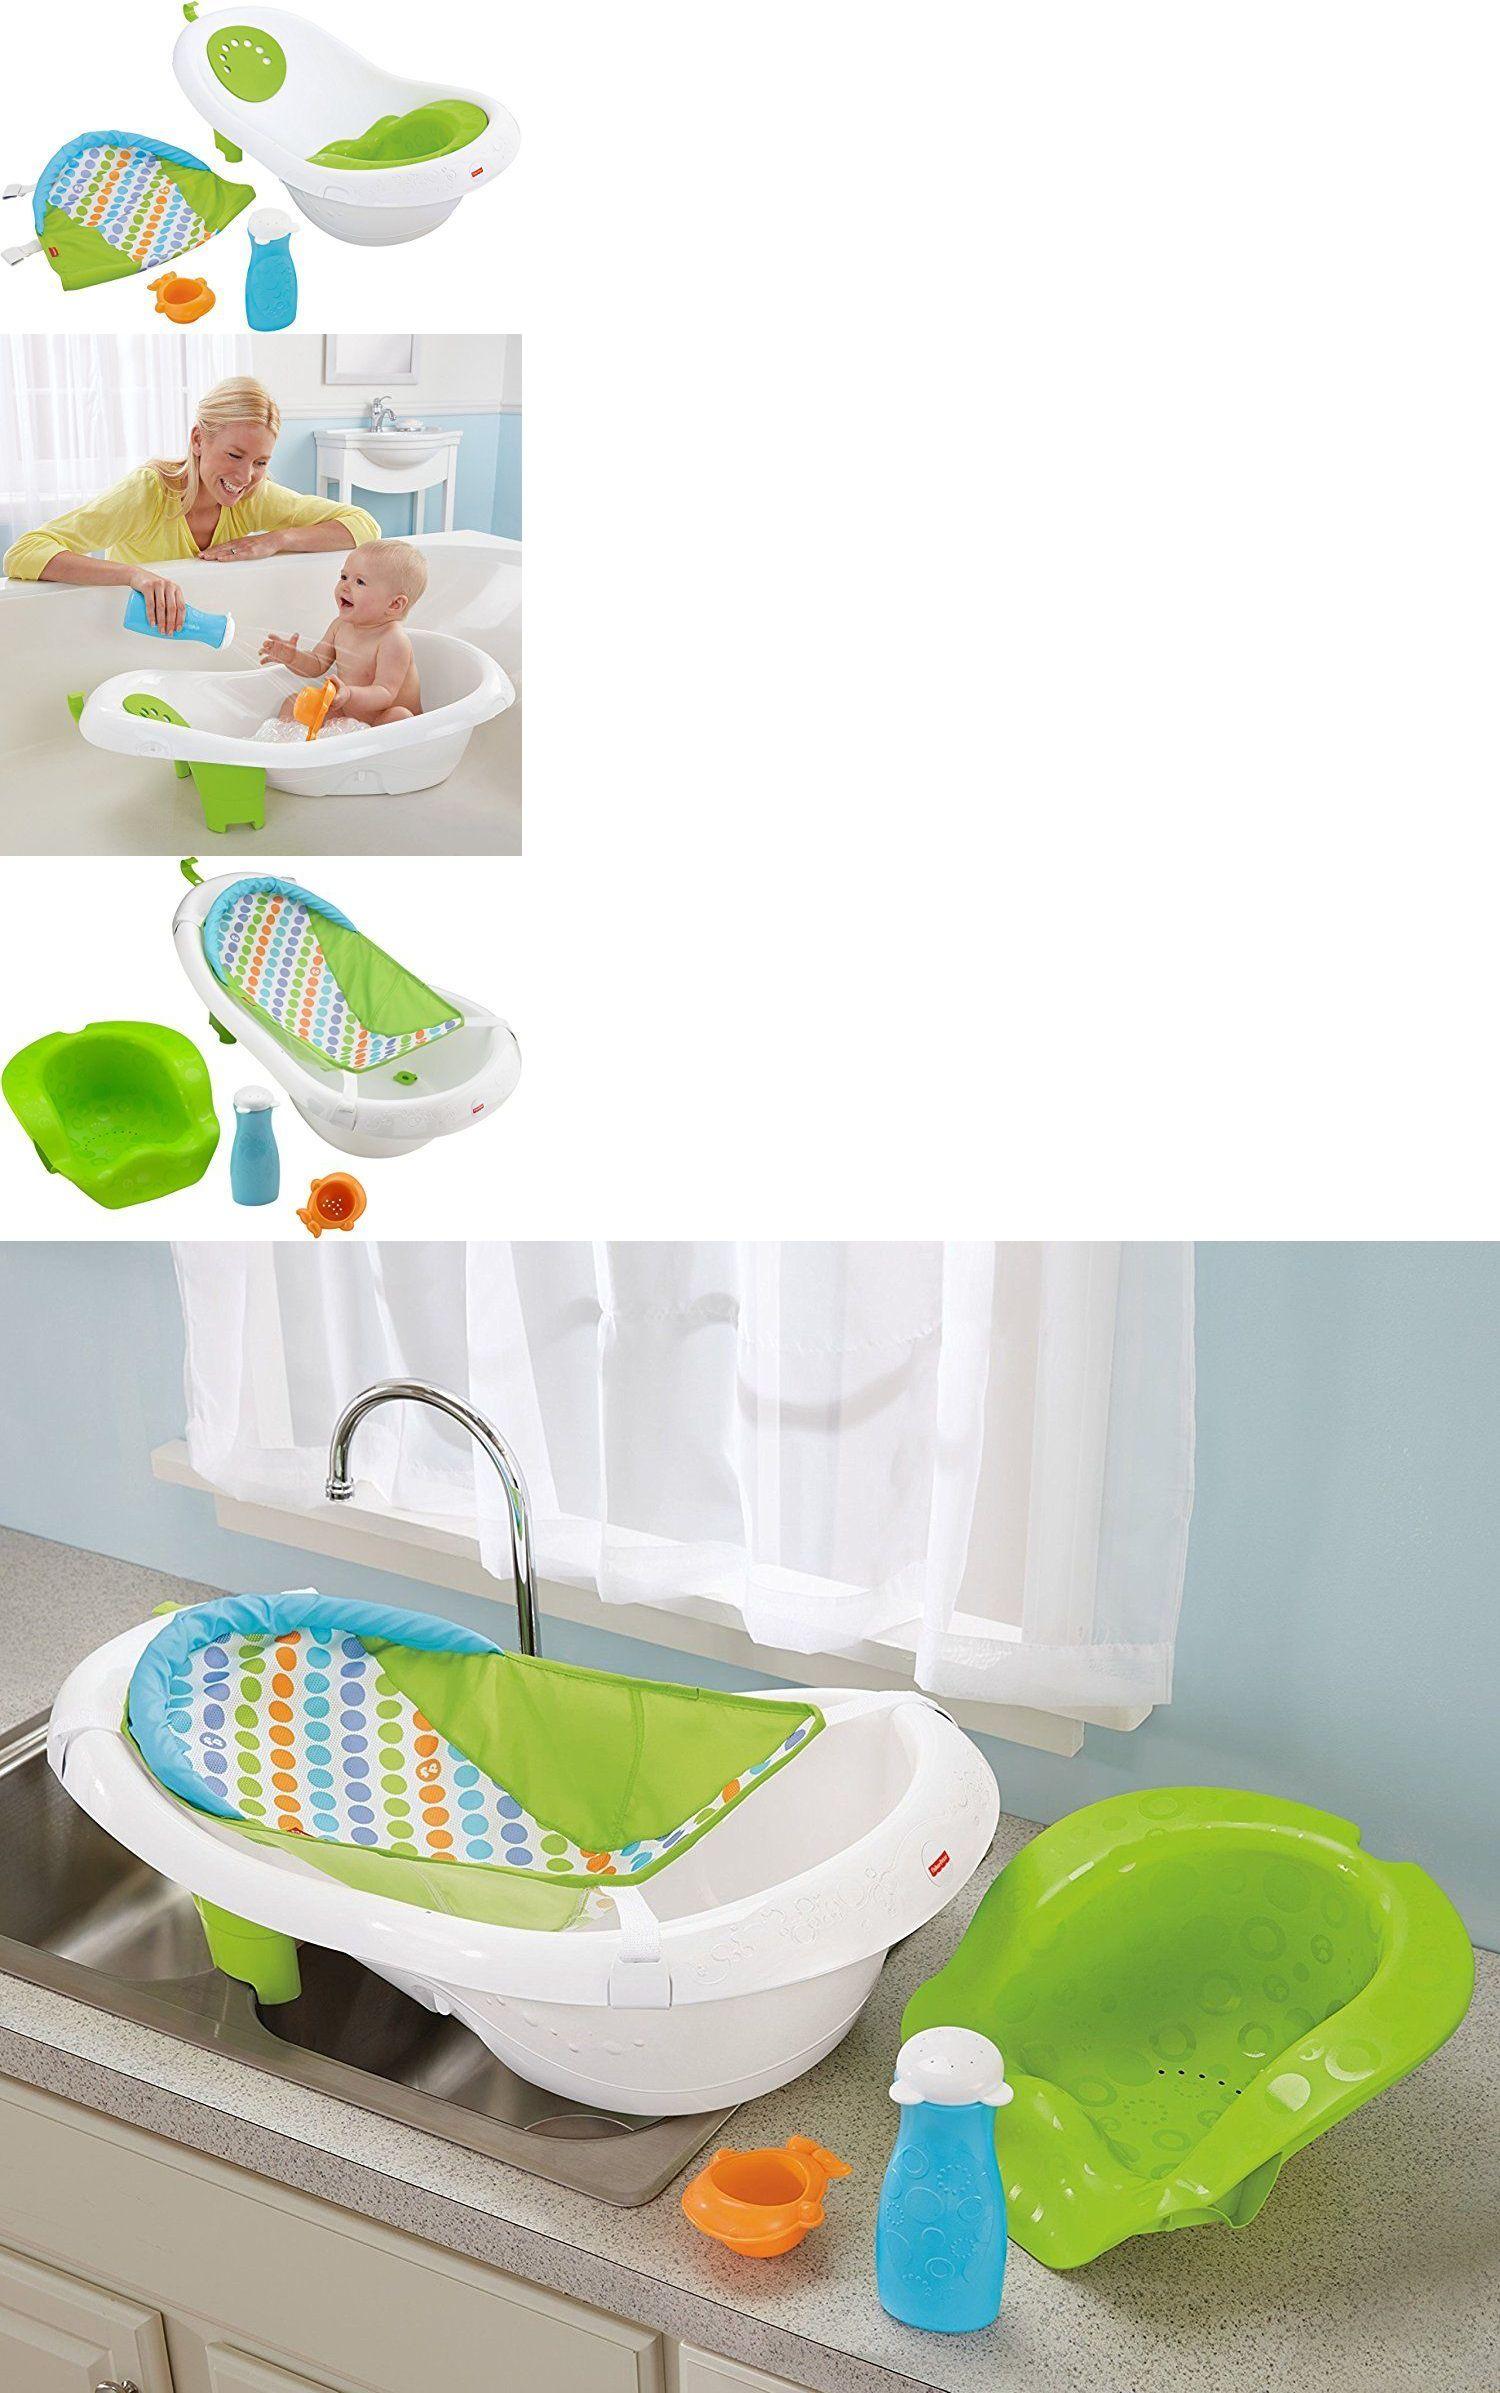 403b2e5eef2 Bathing and Grooming 20394  Fisher-Price 4-In-1 Sling N Seat Tub